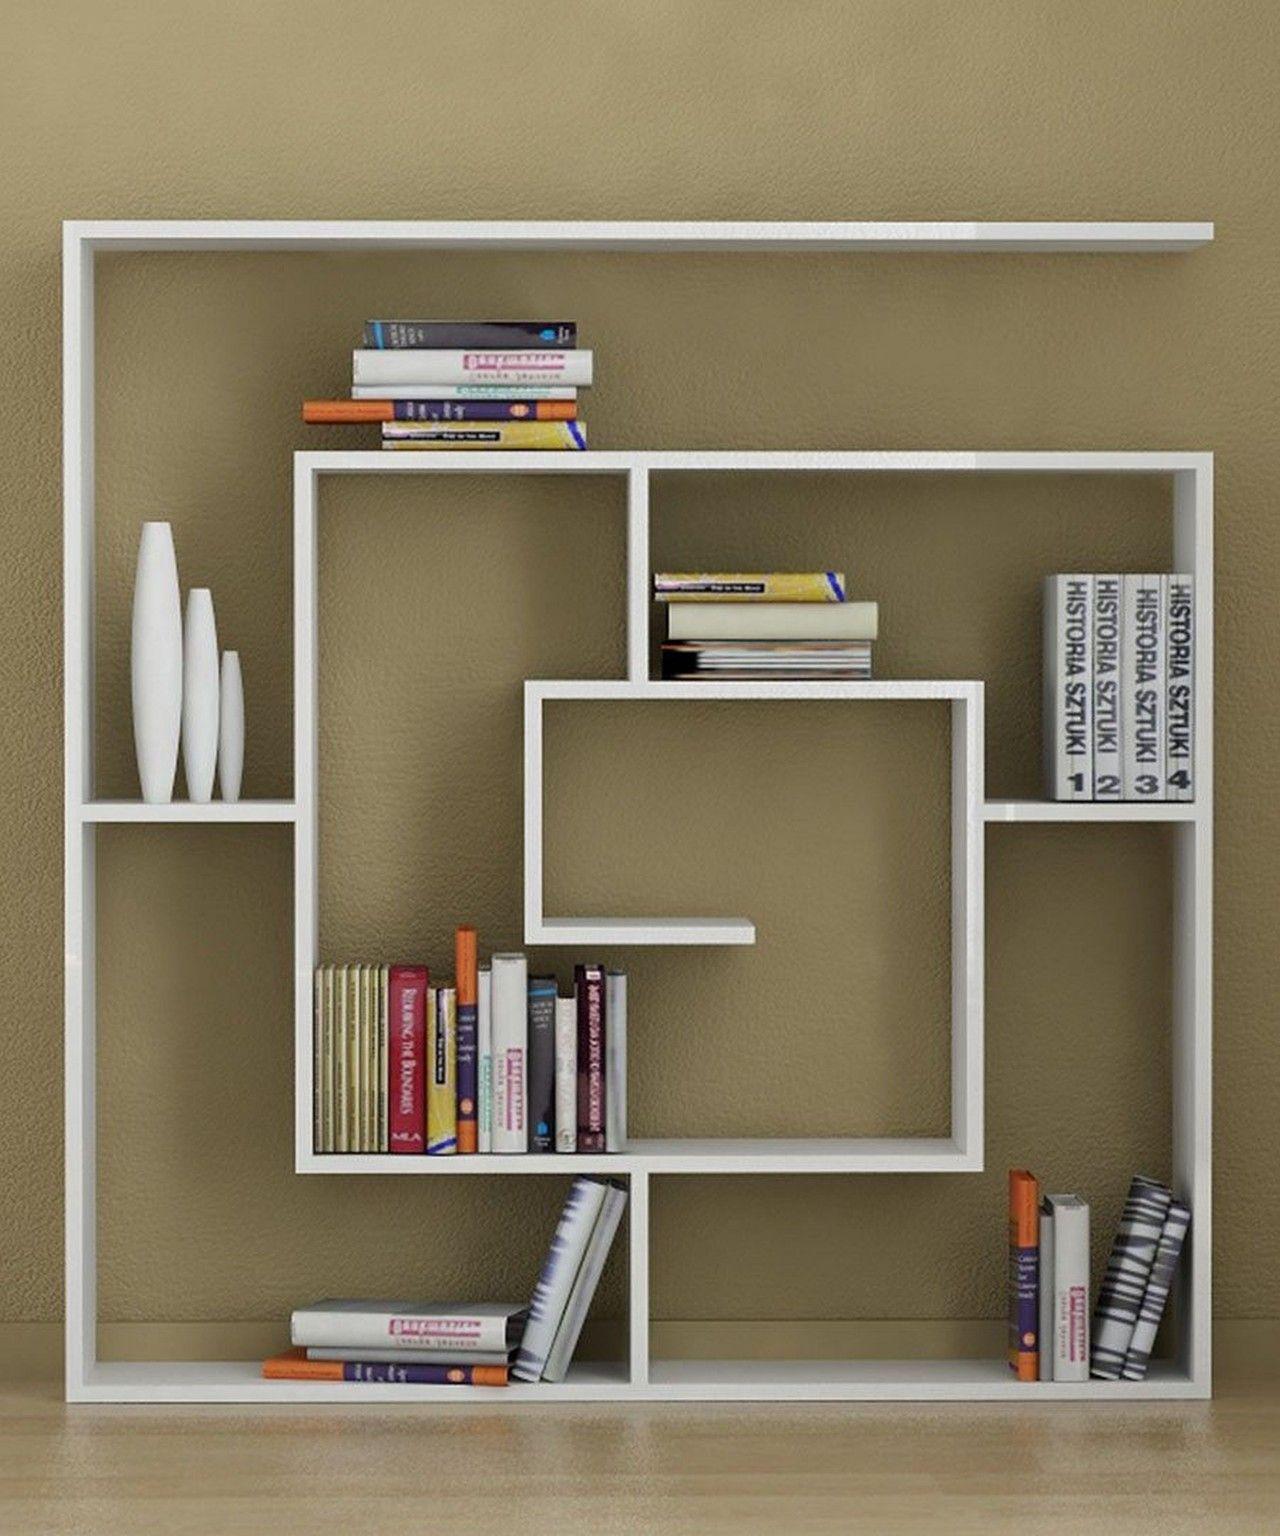 Awesome Furniture U0026 Furnishing, Amazing White Book Shelf On Cream Wall Shelves  Shelving Wall Books Modern Bookshelves Bookcase Design Built Bookcases  Ideas Shelf ...